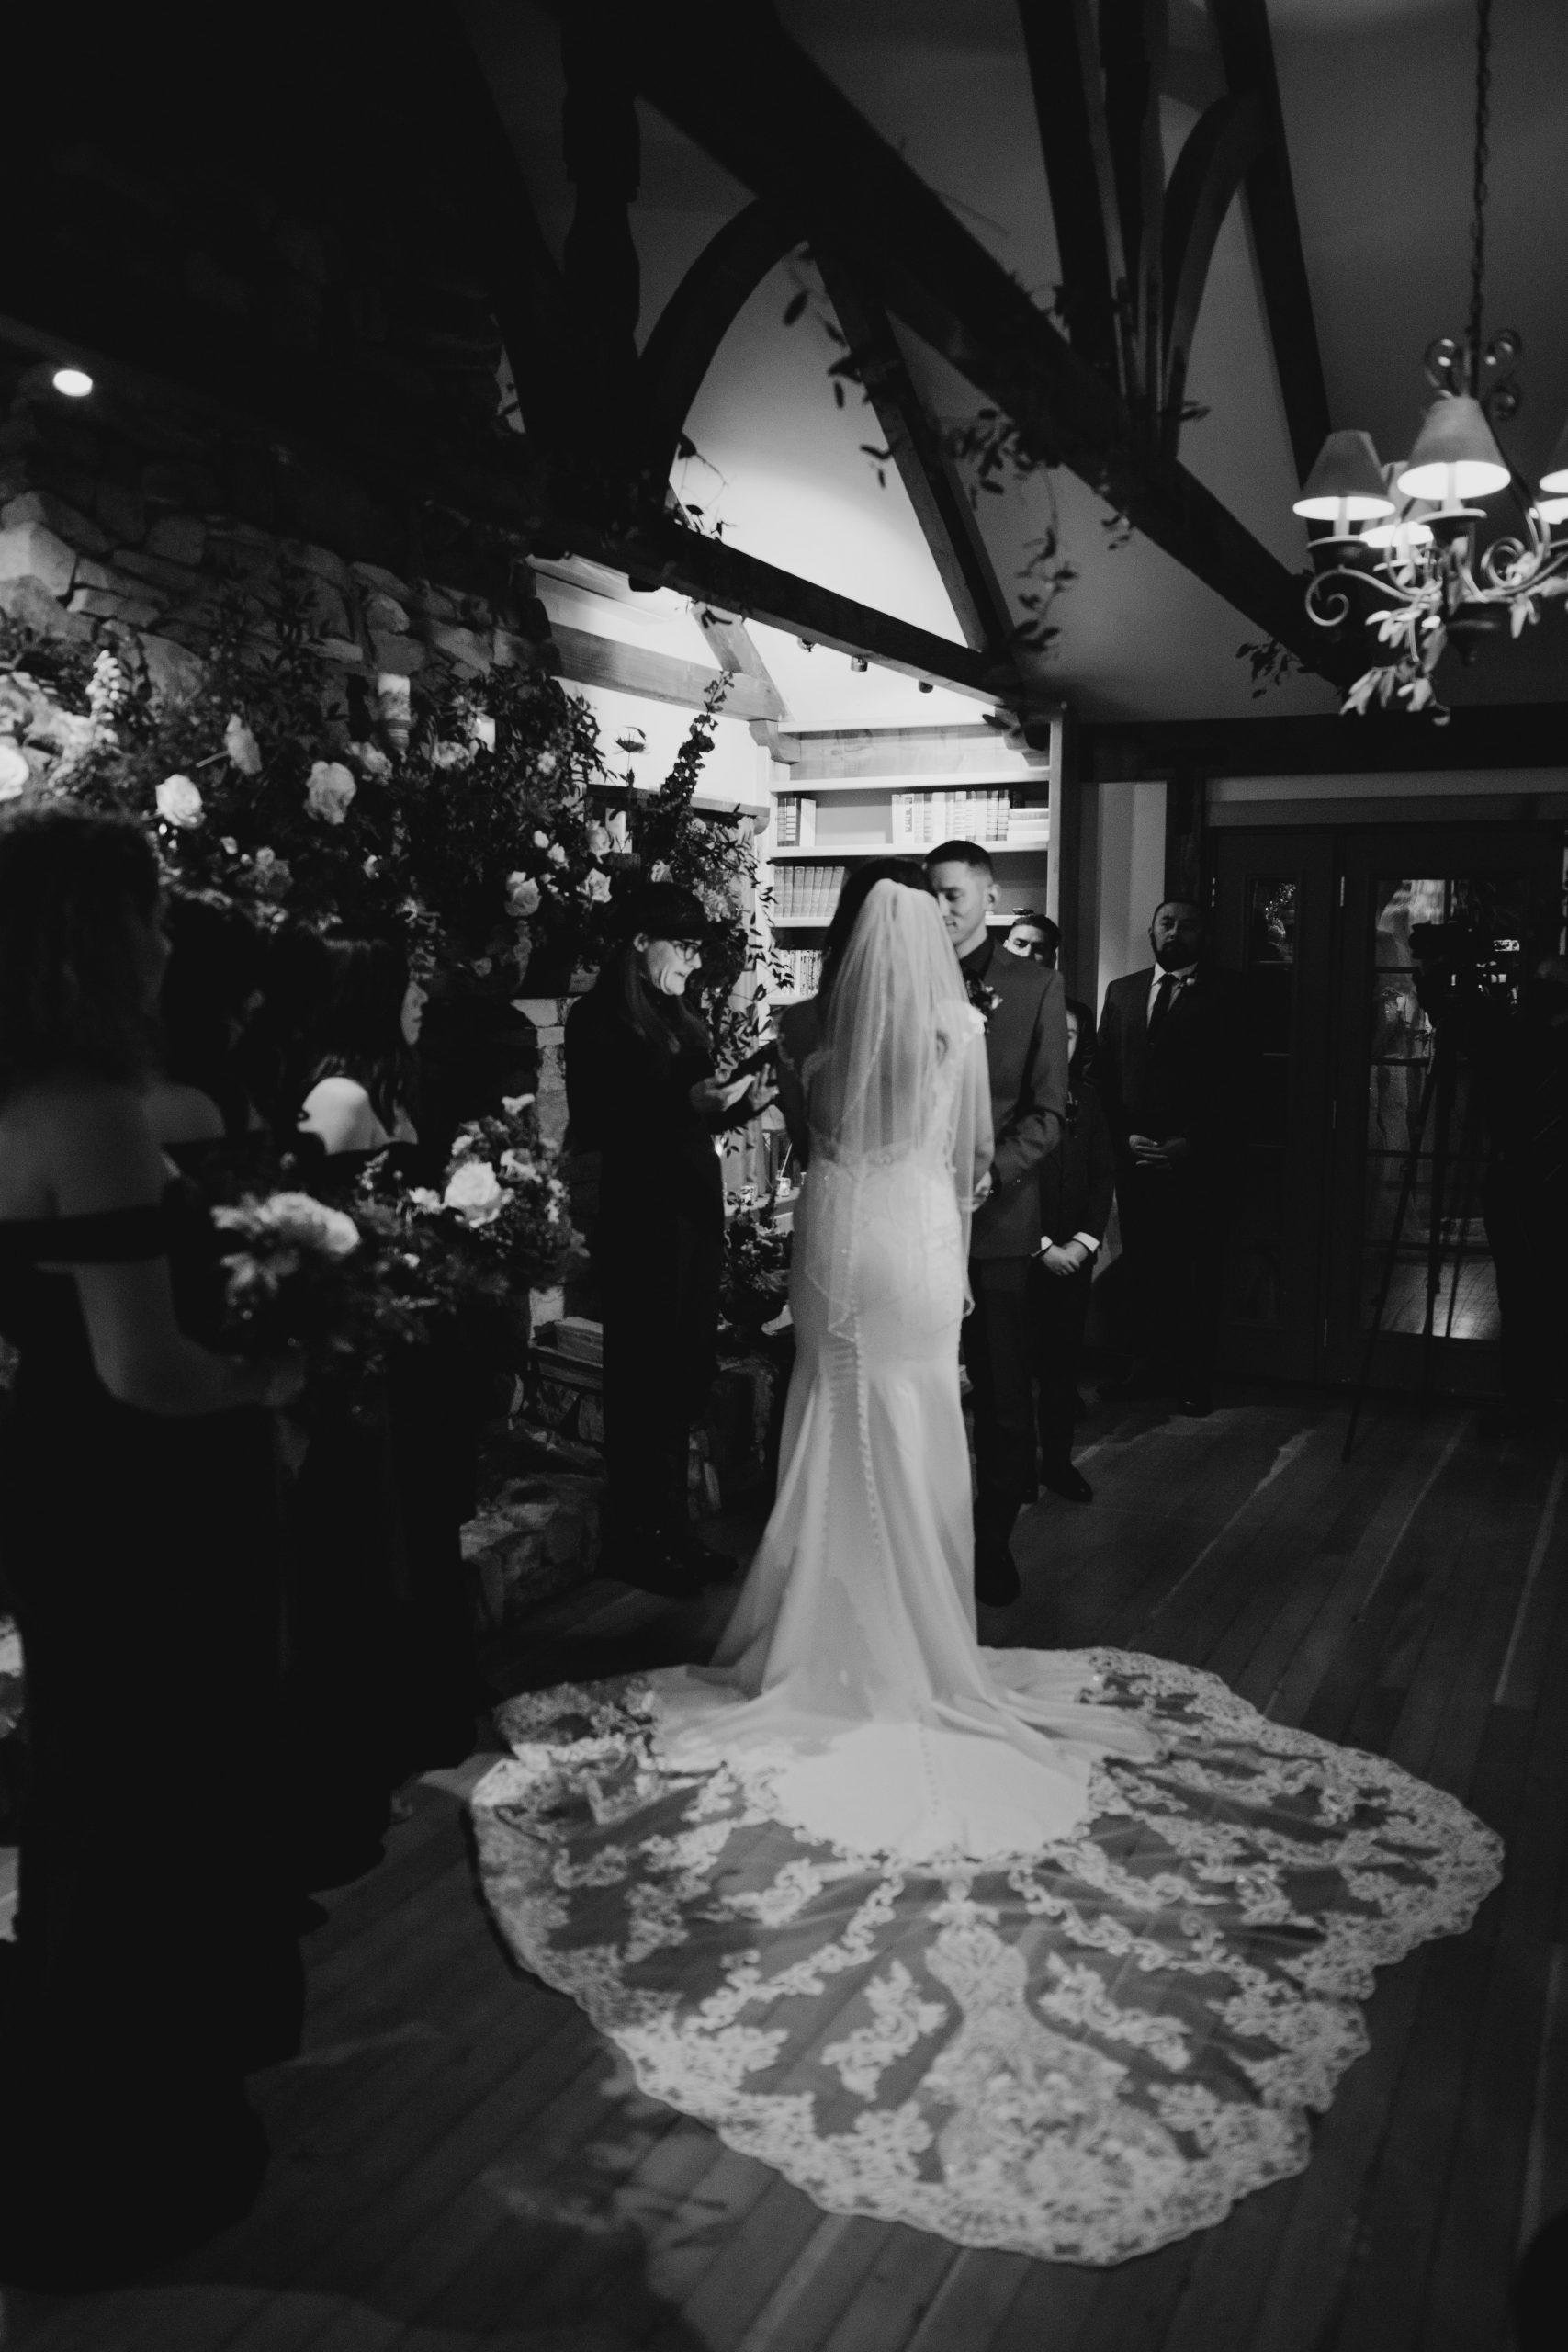 Arrowhead Pine Rose Wedding Ceremony Black and White, image by Fatima Elreda Photo